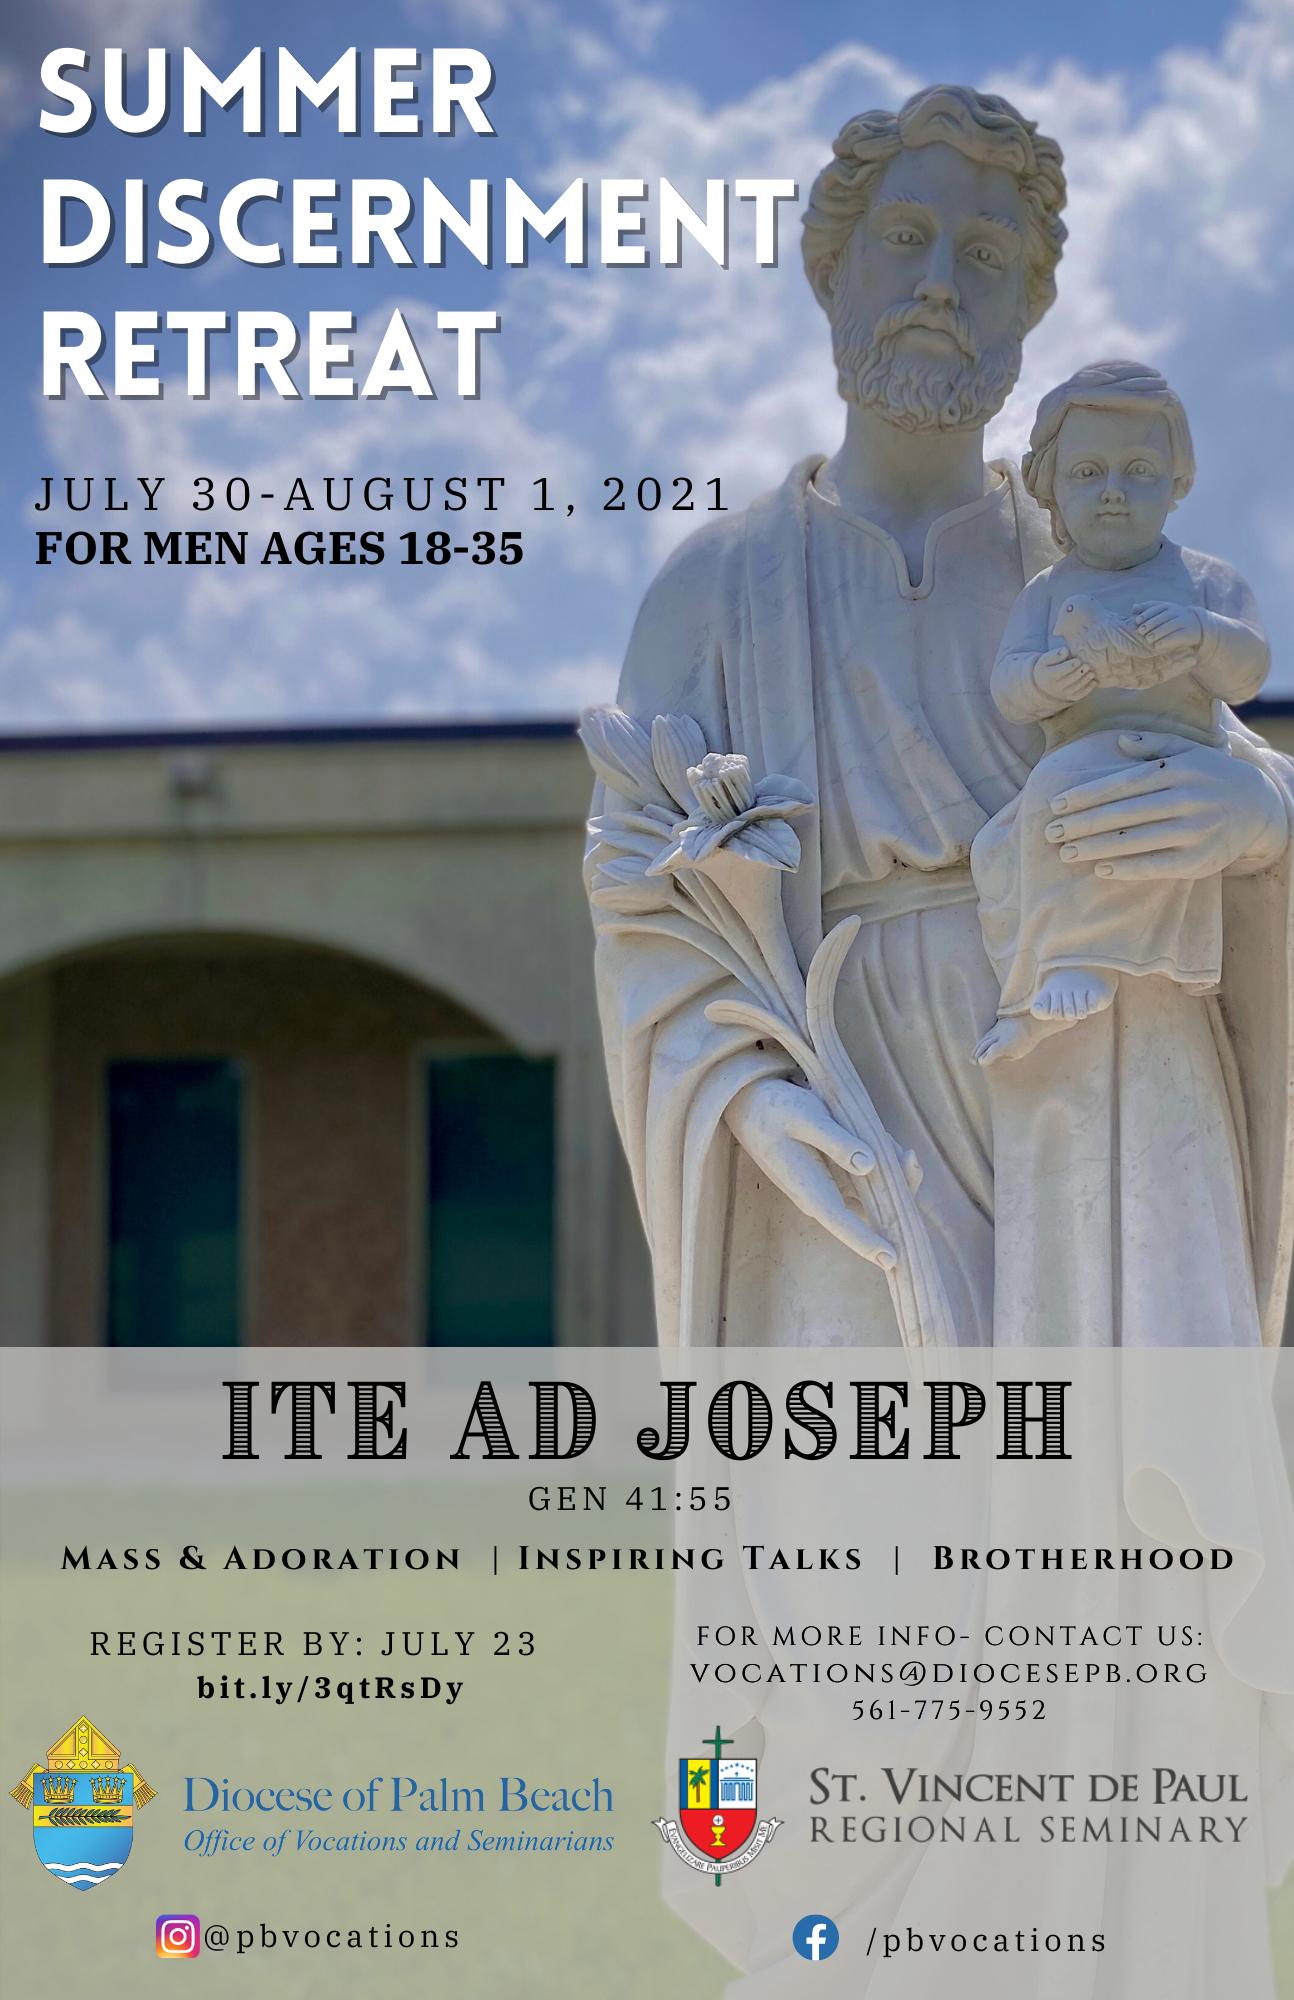 Men's Summer Discernment Retreat - July 30 - August 1, 2021